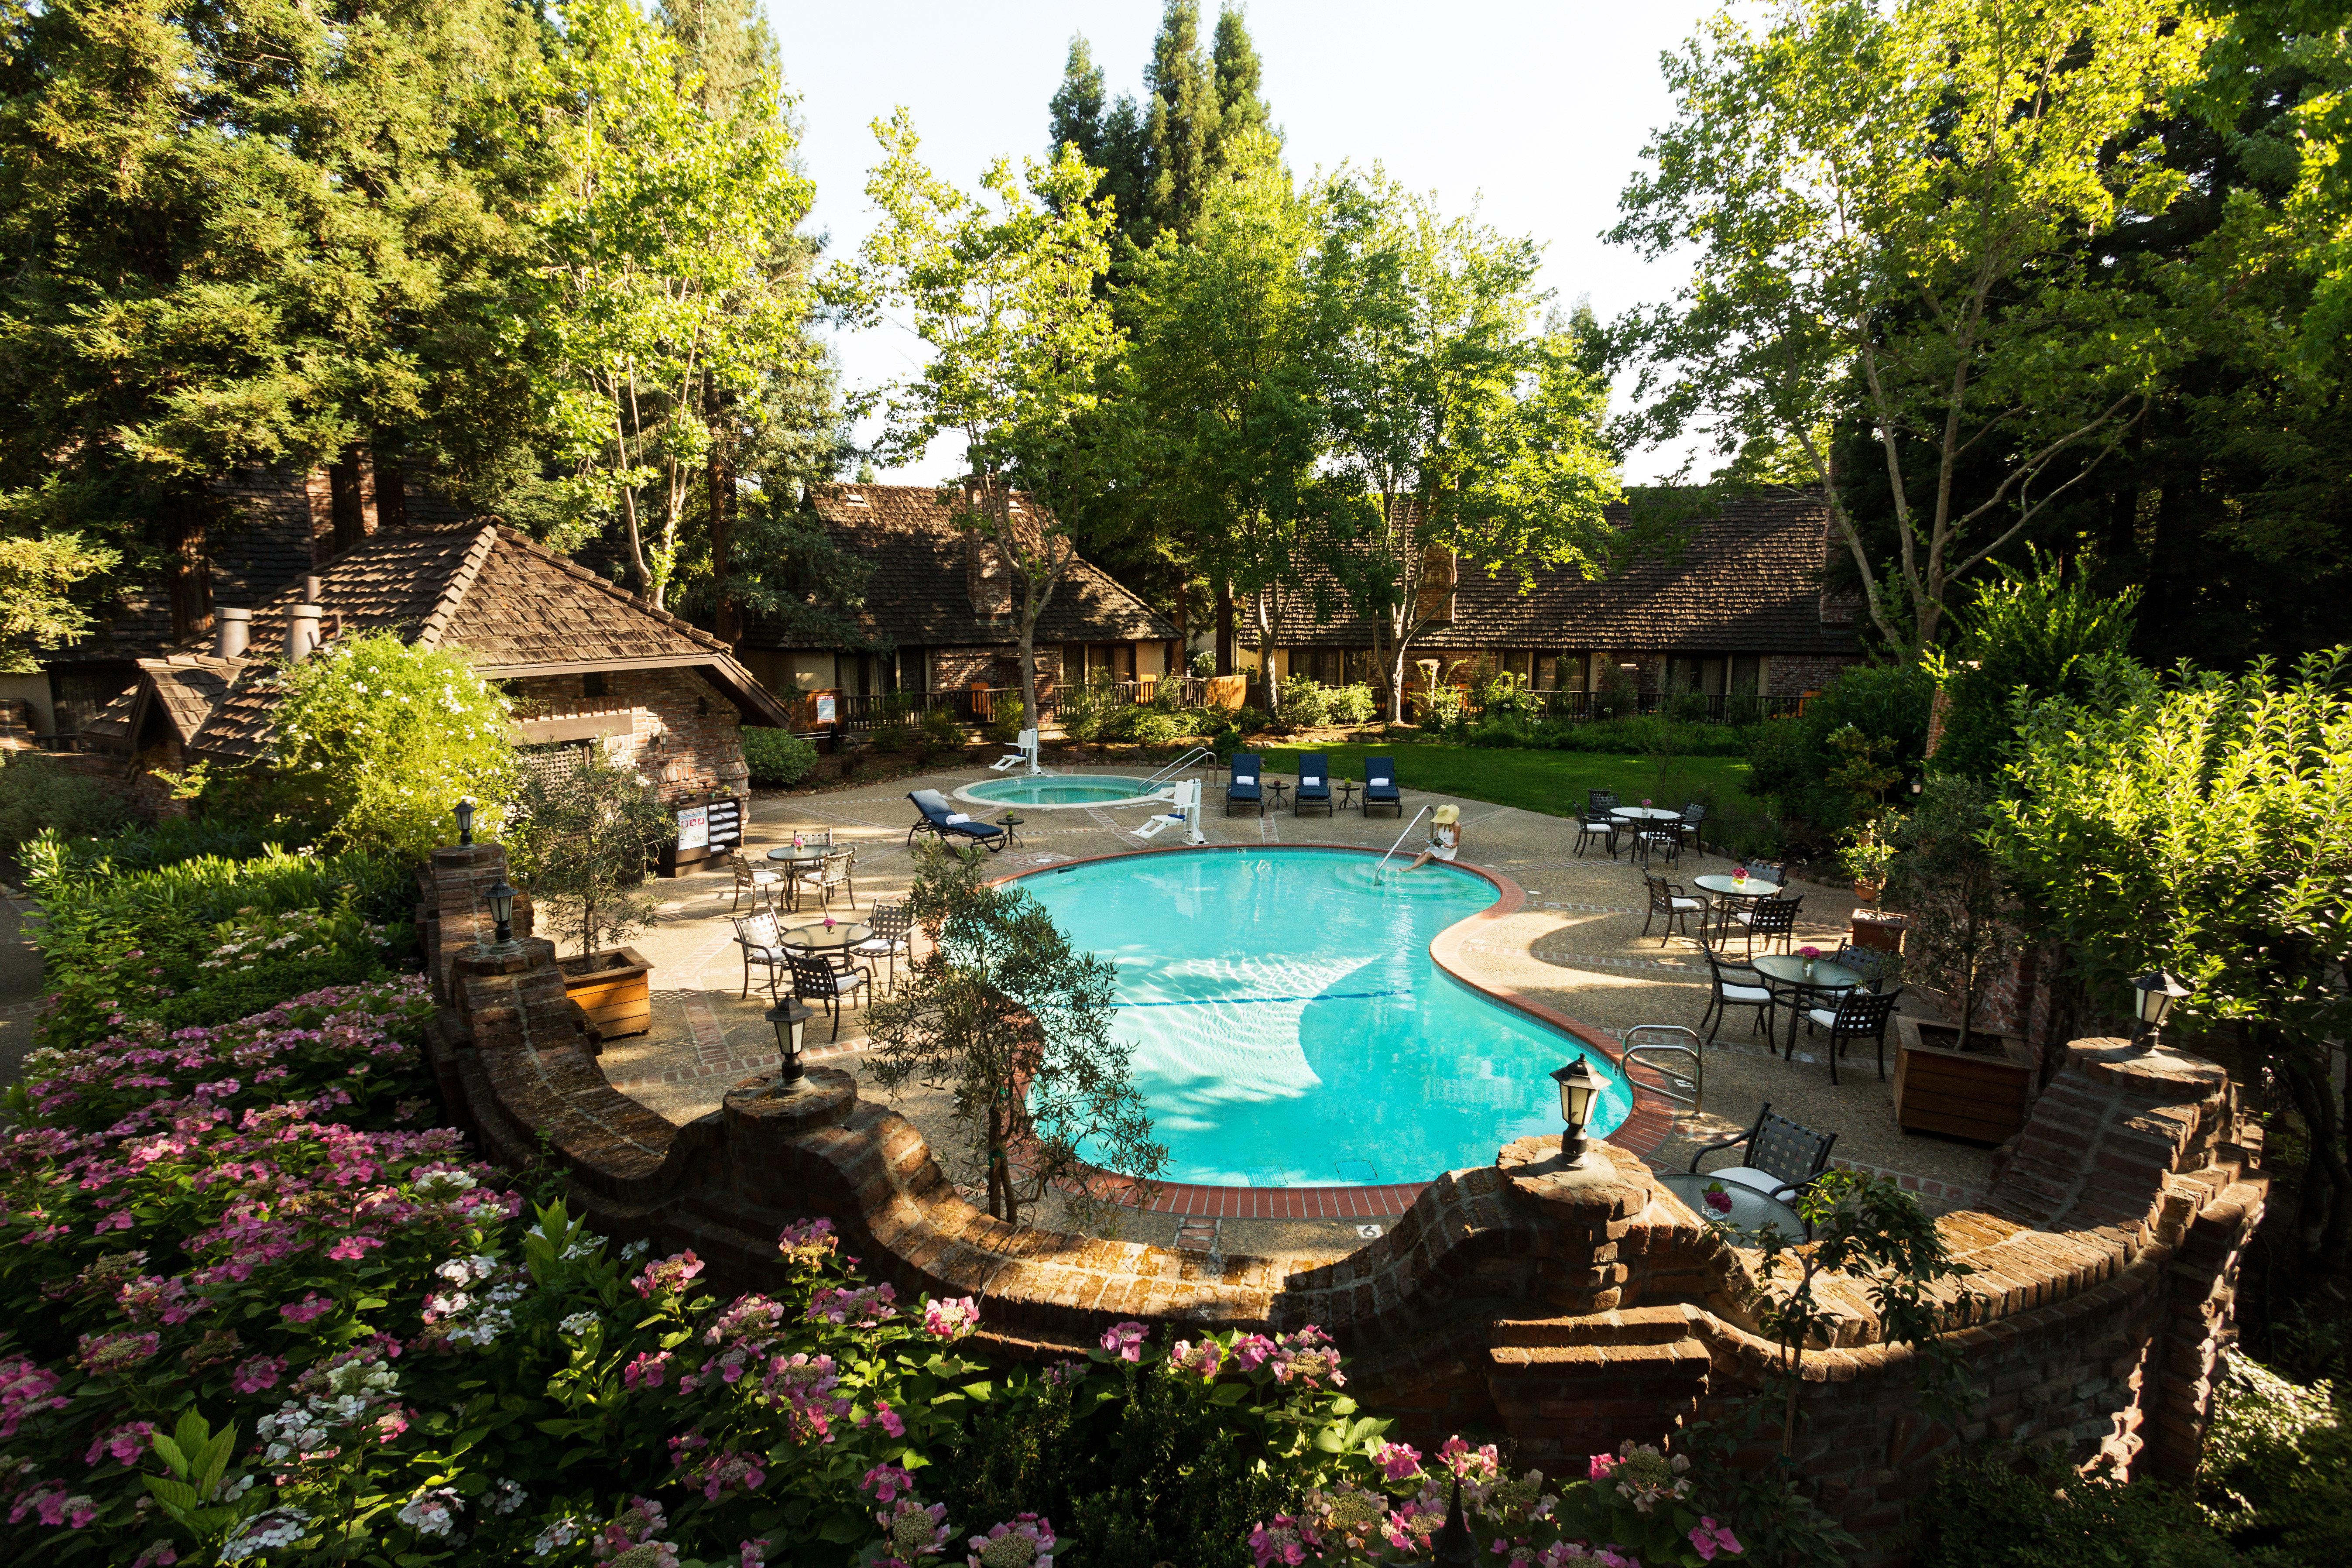 Grounds Health + Wellness Hotels Inn Patio Pool Romantic Spa Retreats Terrace Trip Ideas tree swimming pool Garden backyard Resort pond botanical garden yard mansion plant surrounded day